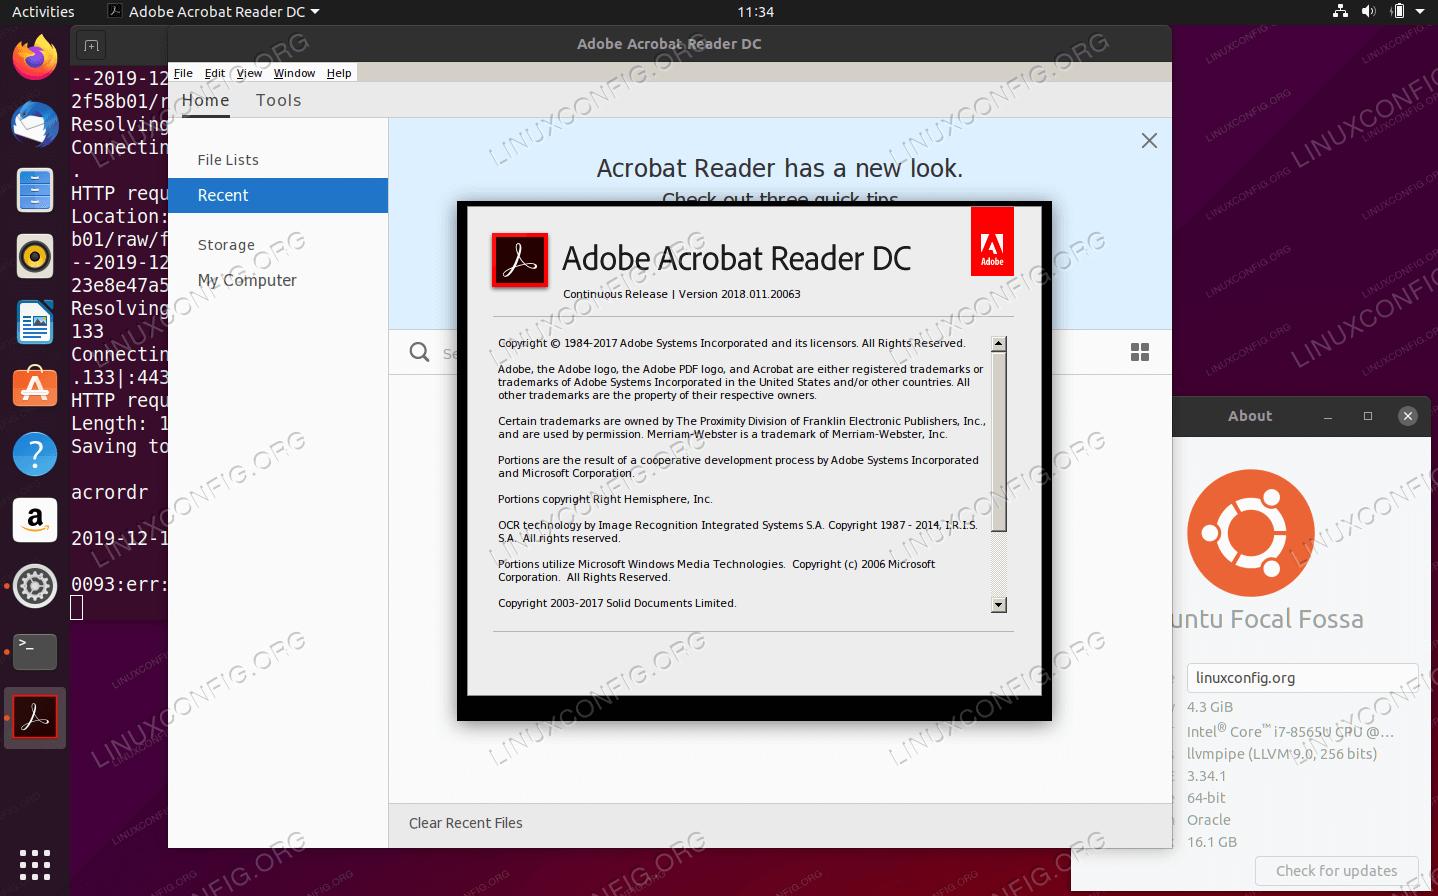 Adobe Acrobat Reader DC (WINE) on Ubuntu 20.04 Focal Fossa Linux